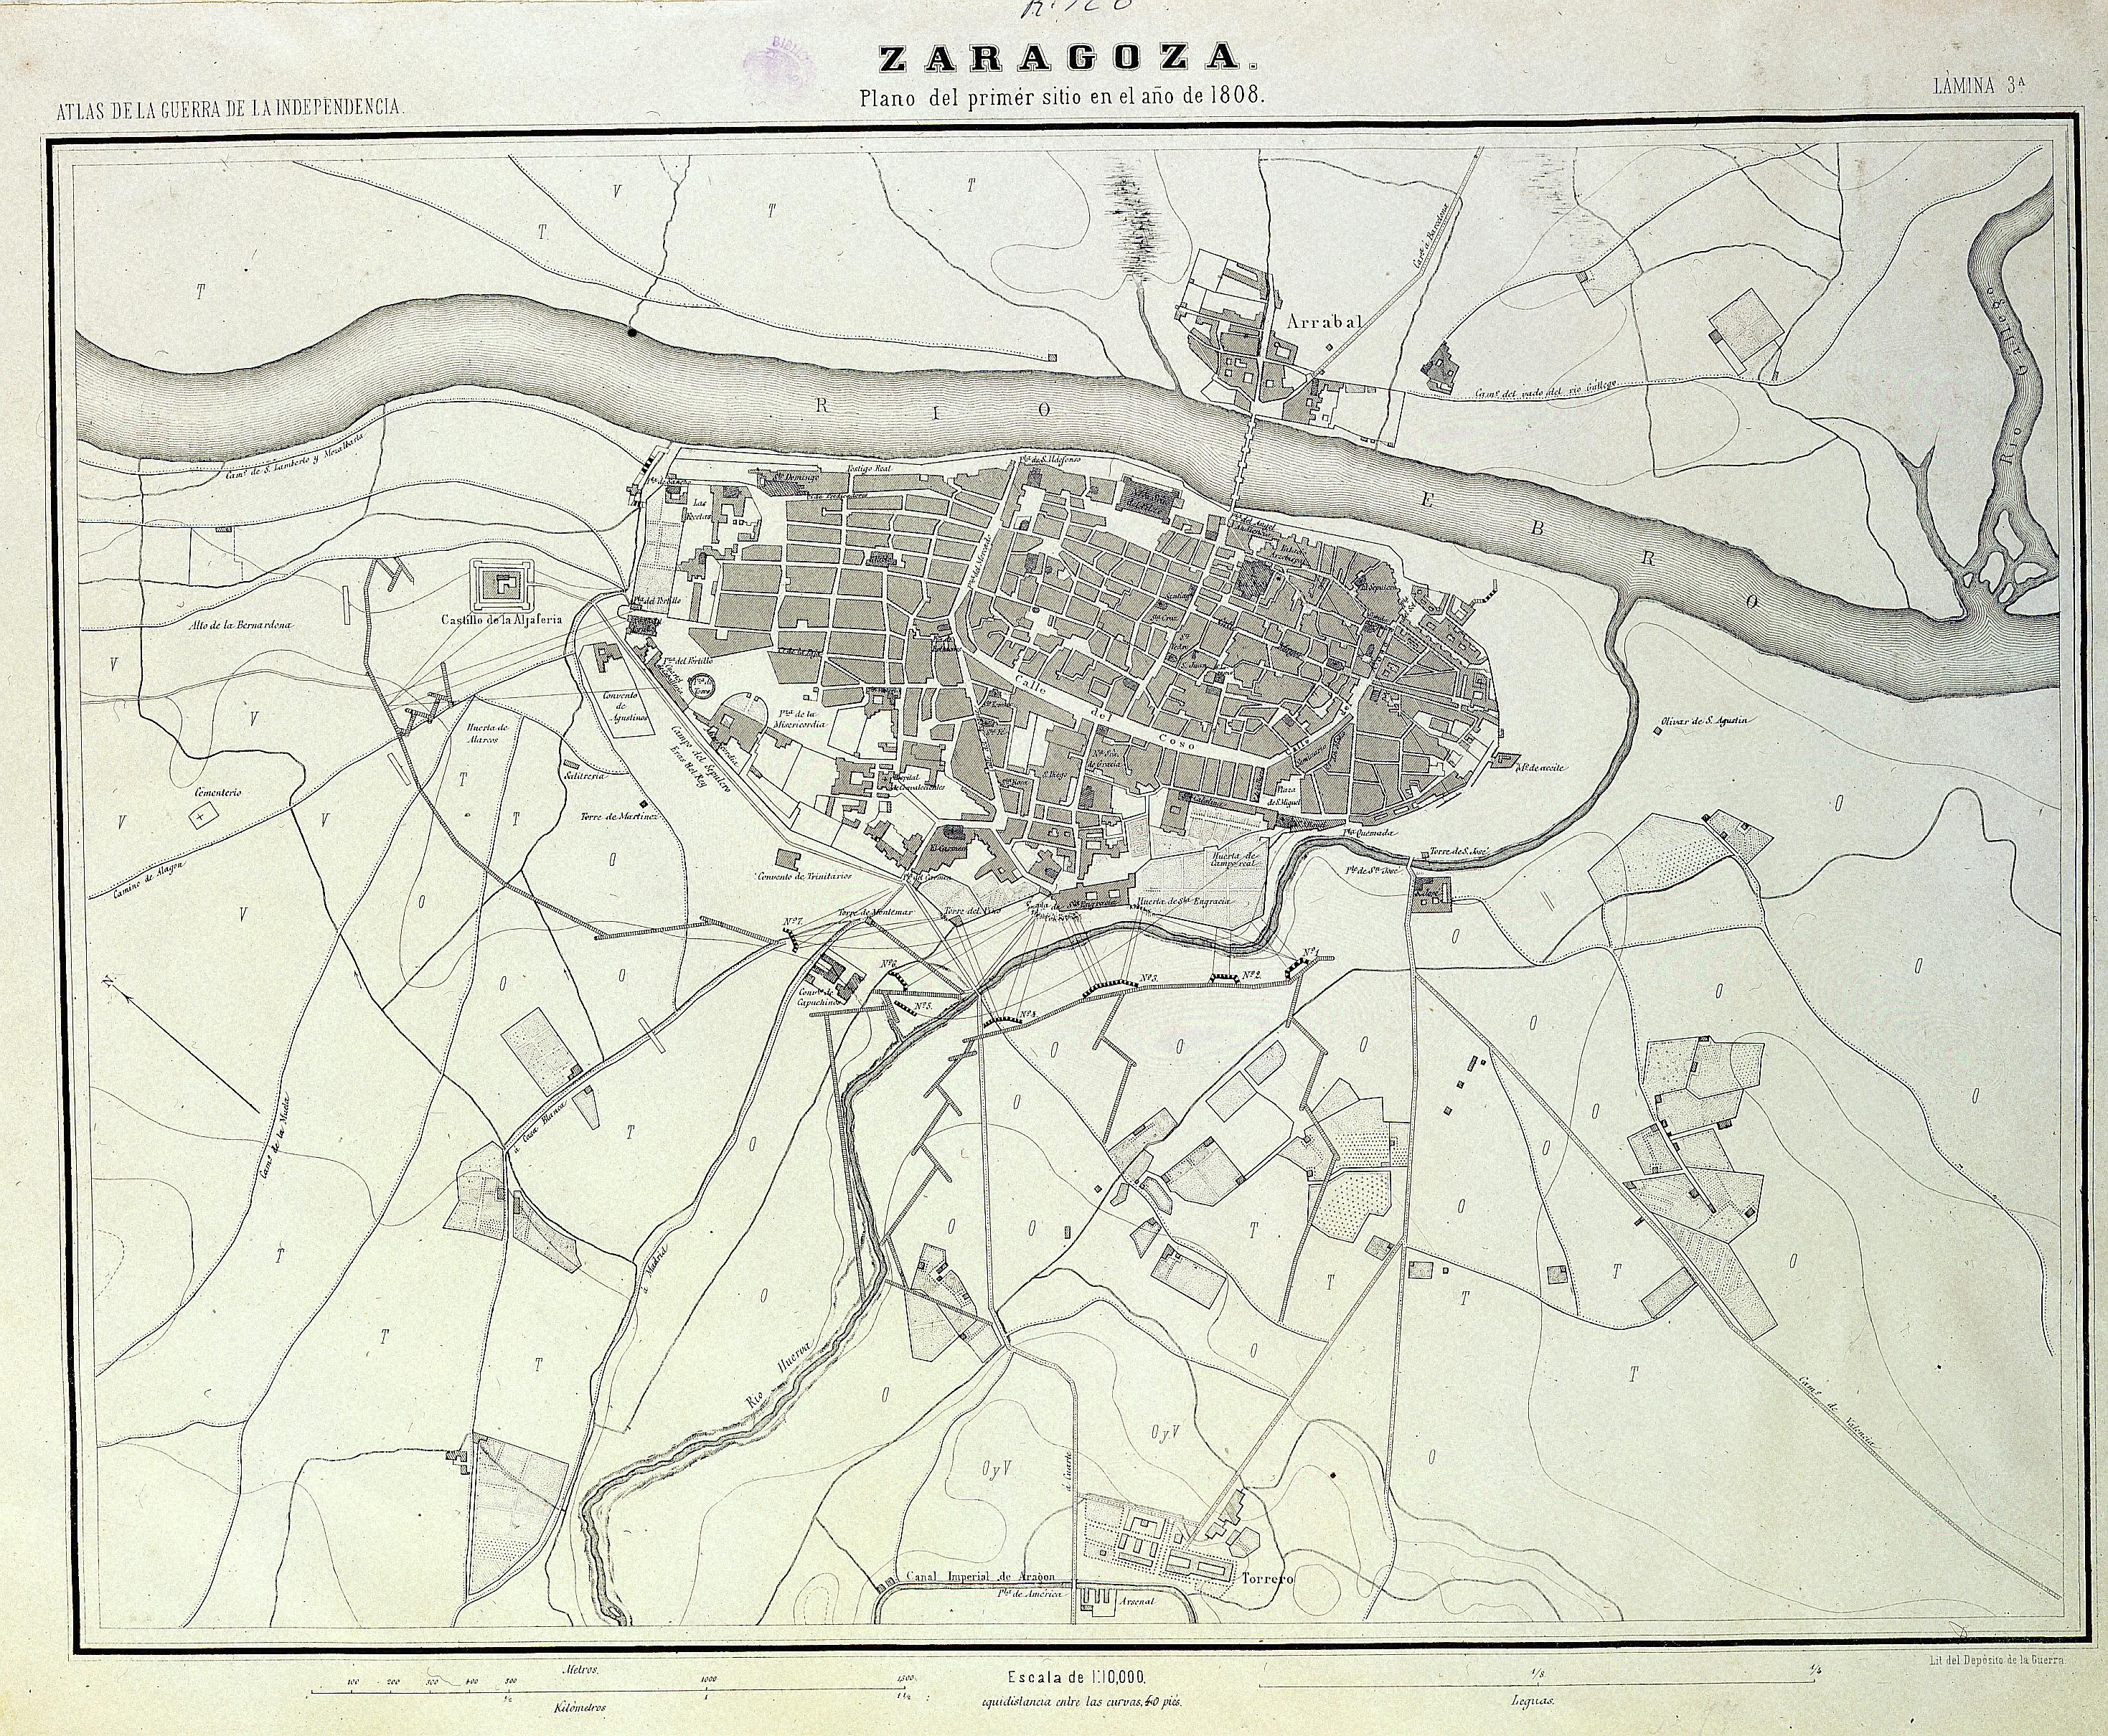 Primer sitio de Zaragoza en 1808